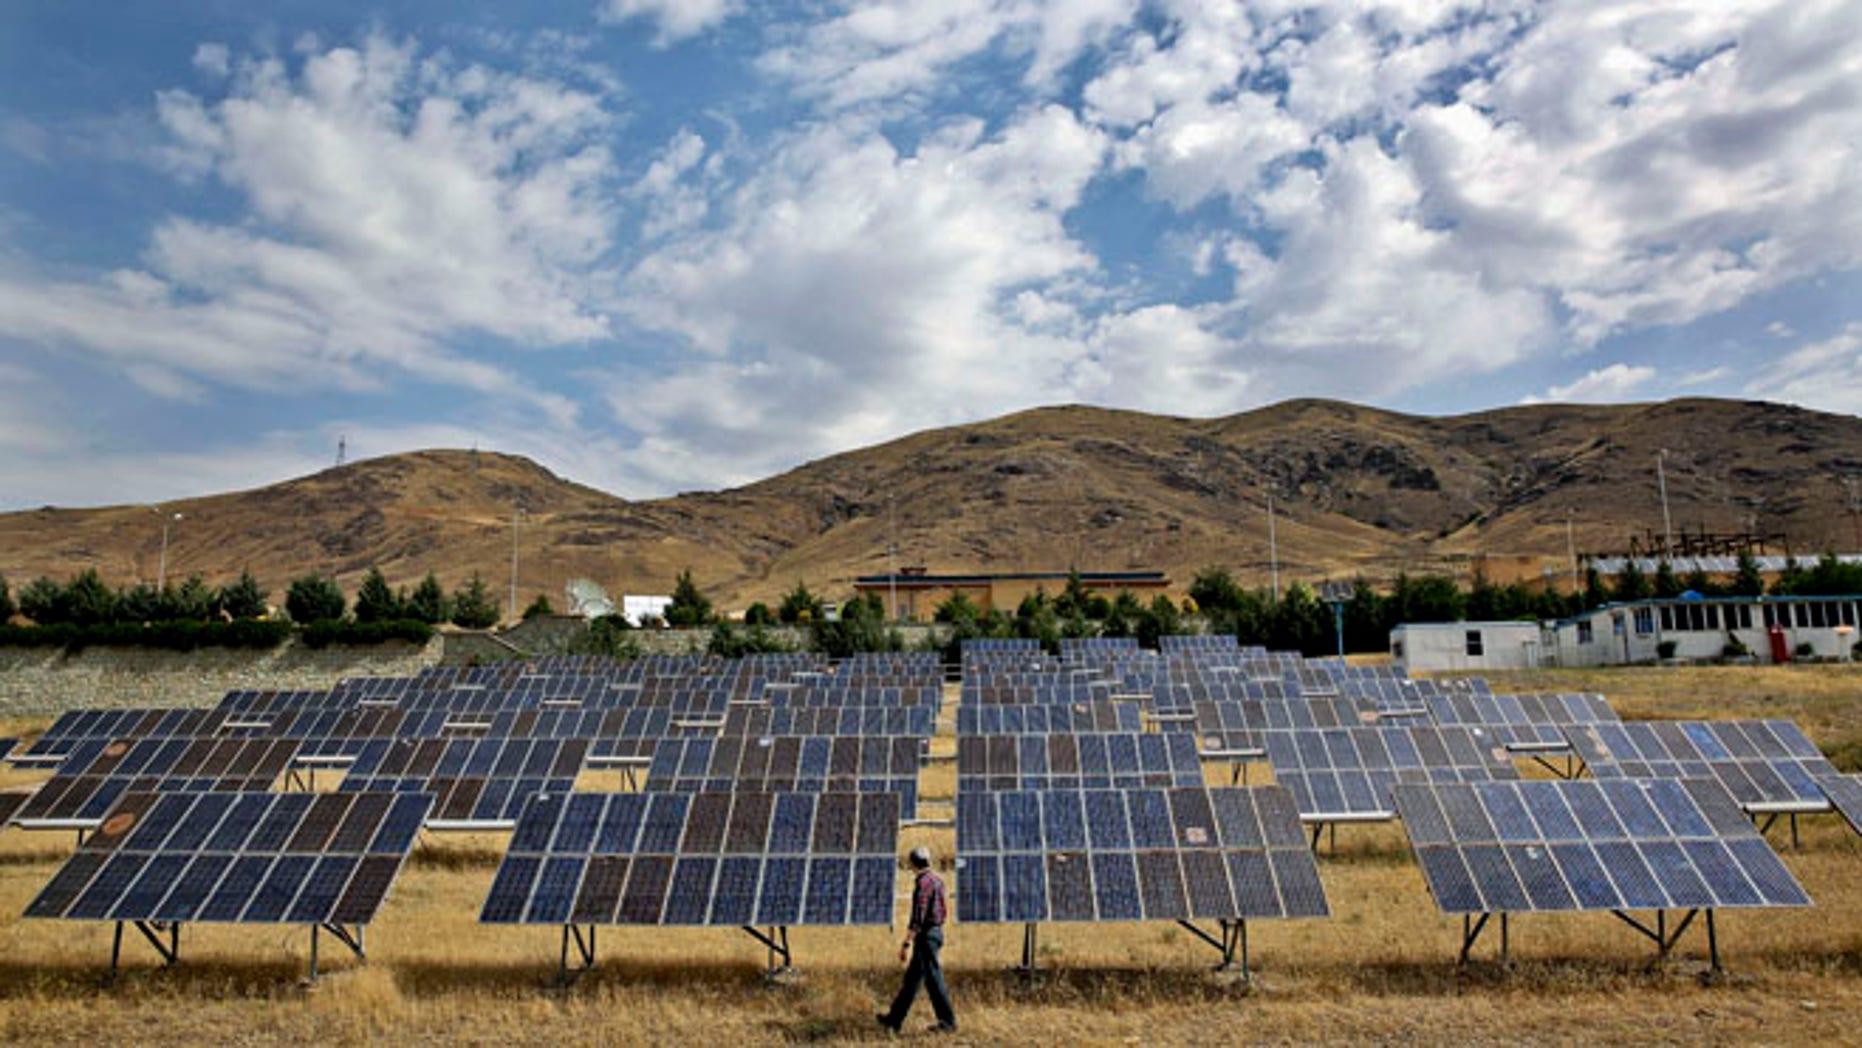 June 22, 2014: A man looks at solar panels at the Taleghan Renewable Energy Site in Taleghan, 99 miles northwest of Tehran, Iran.